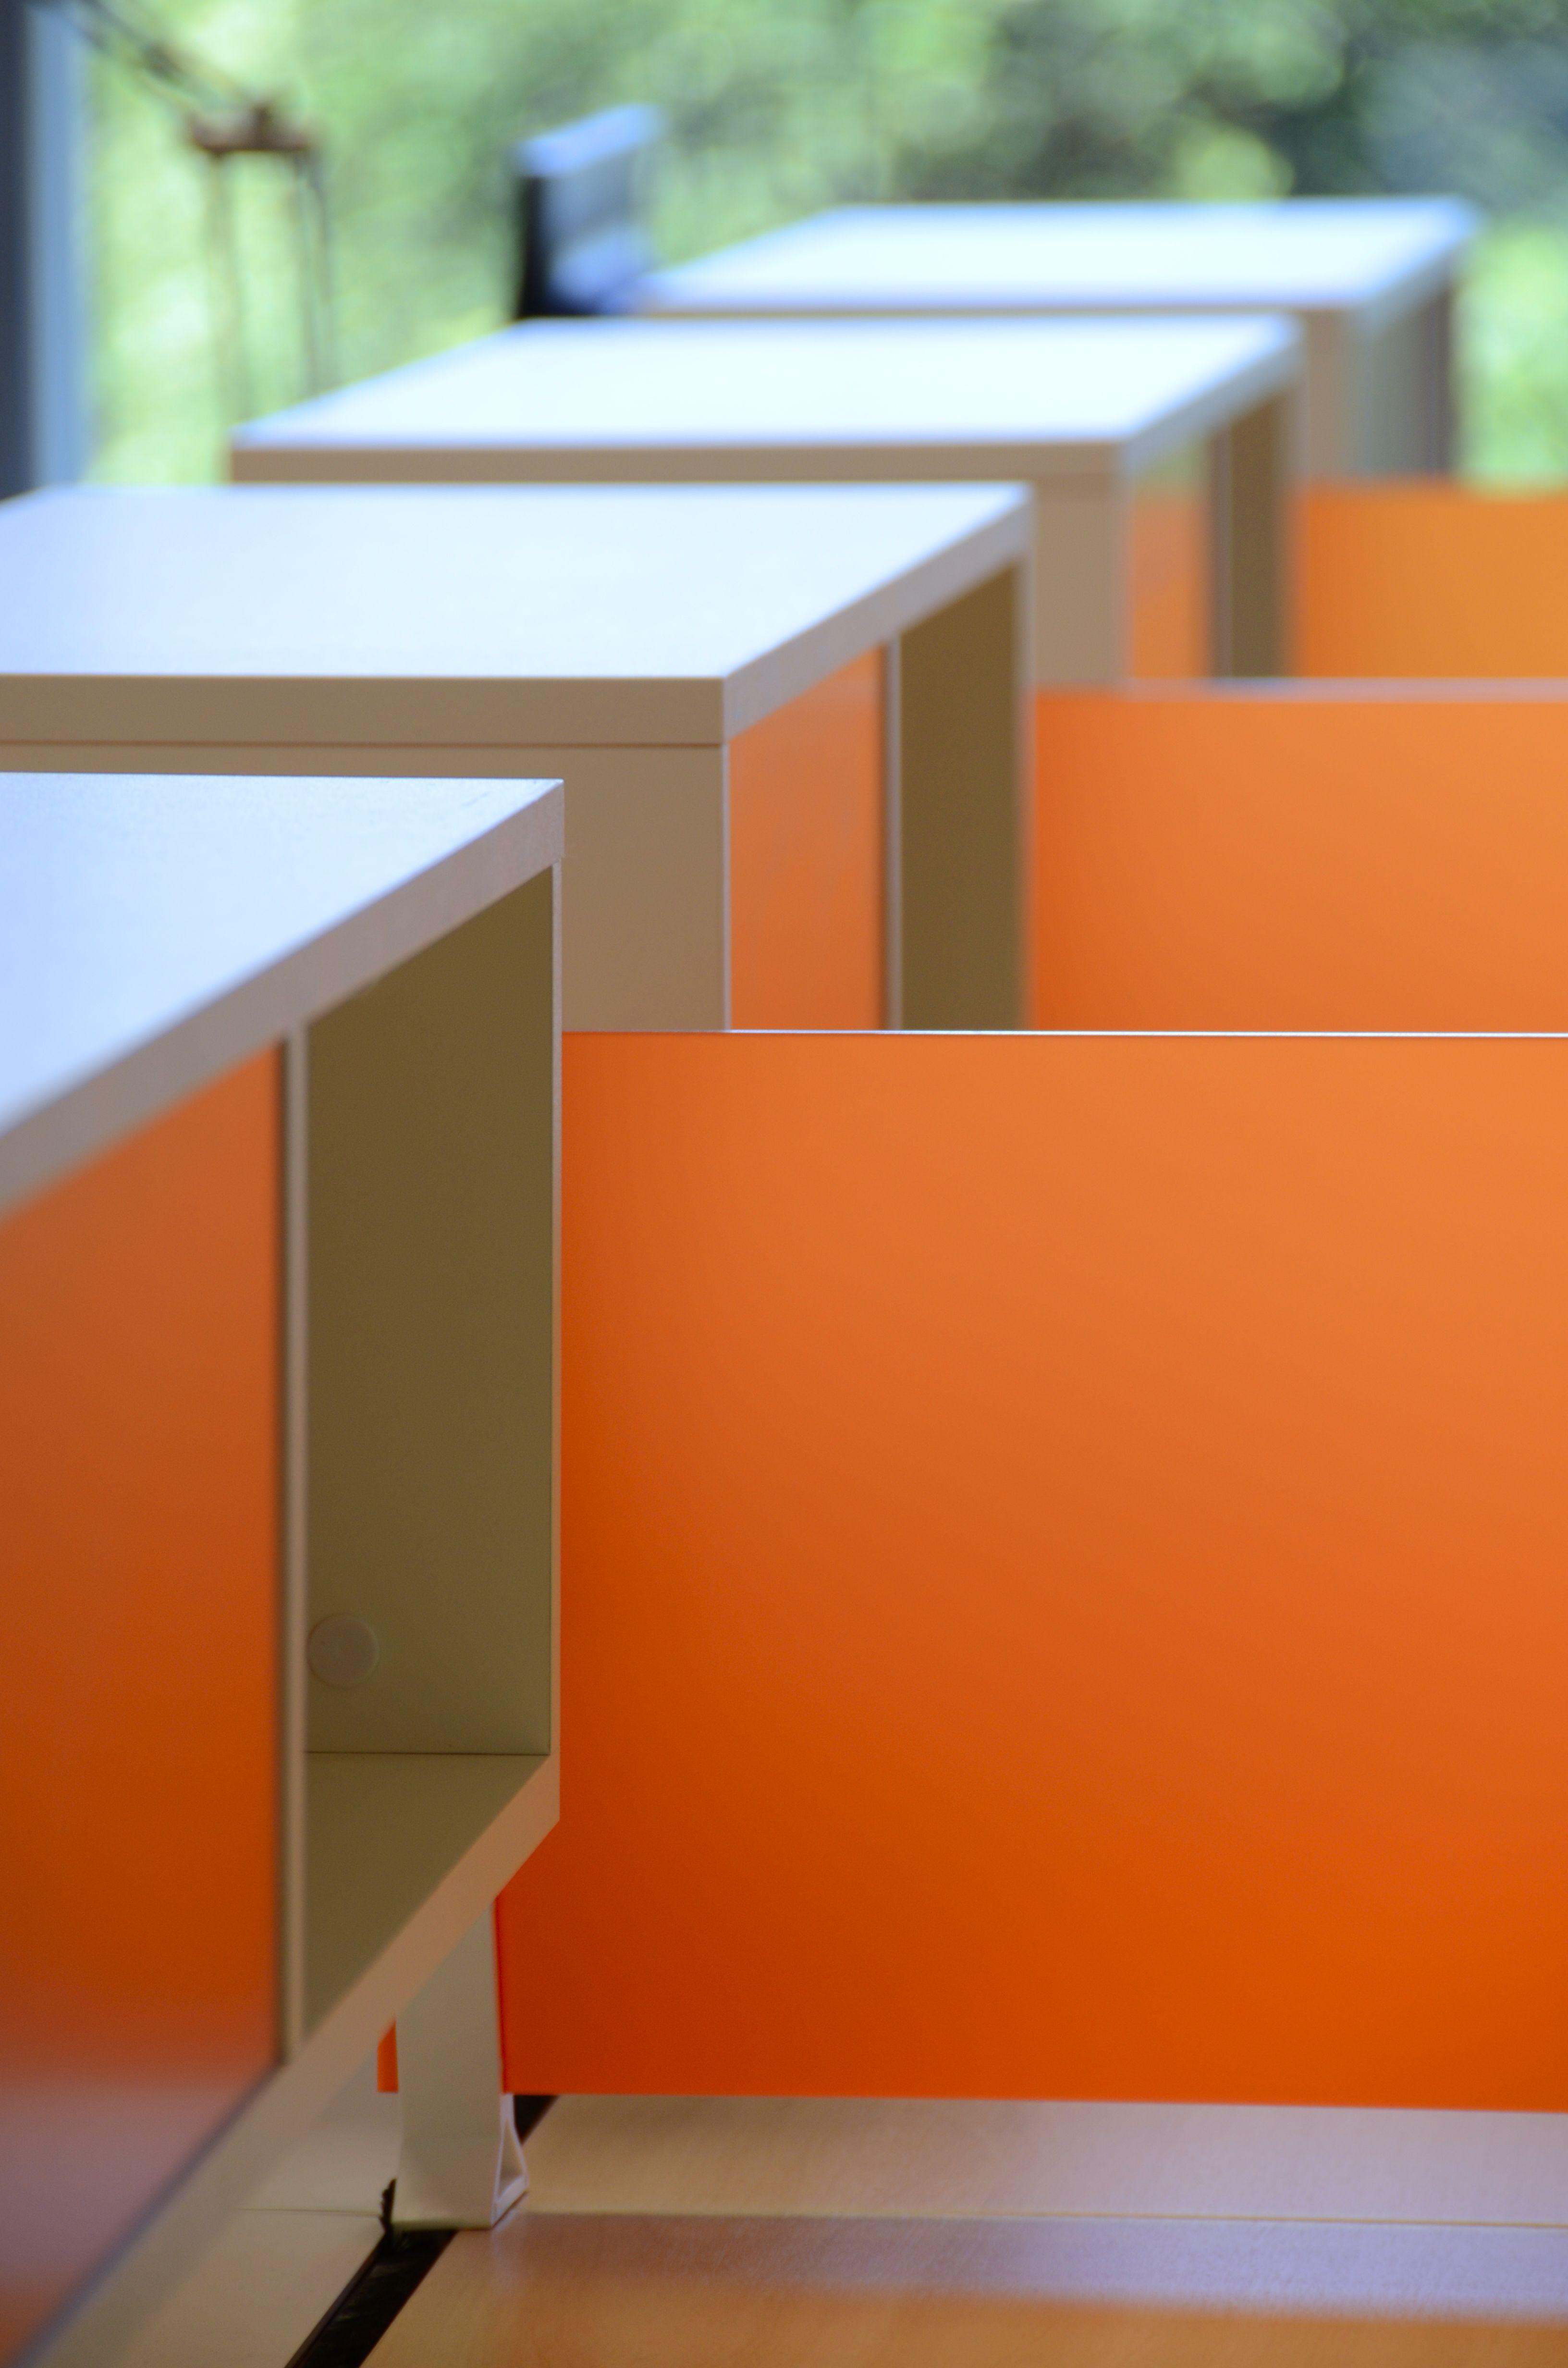 Projeto Aker, arquitetura corporativa #arquitetura #arquiteturacorporativa